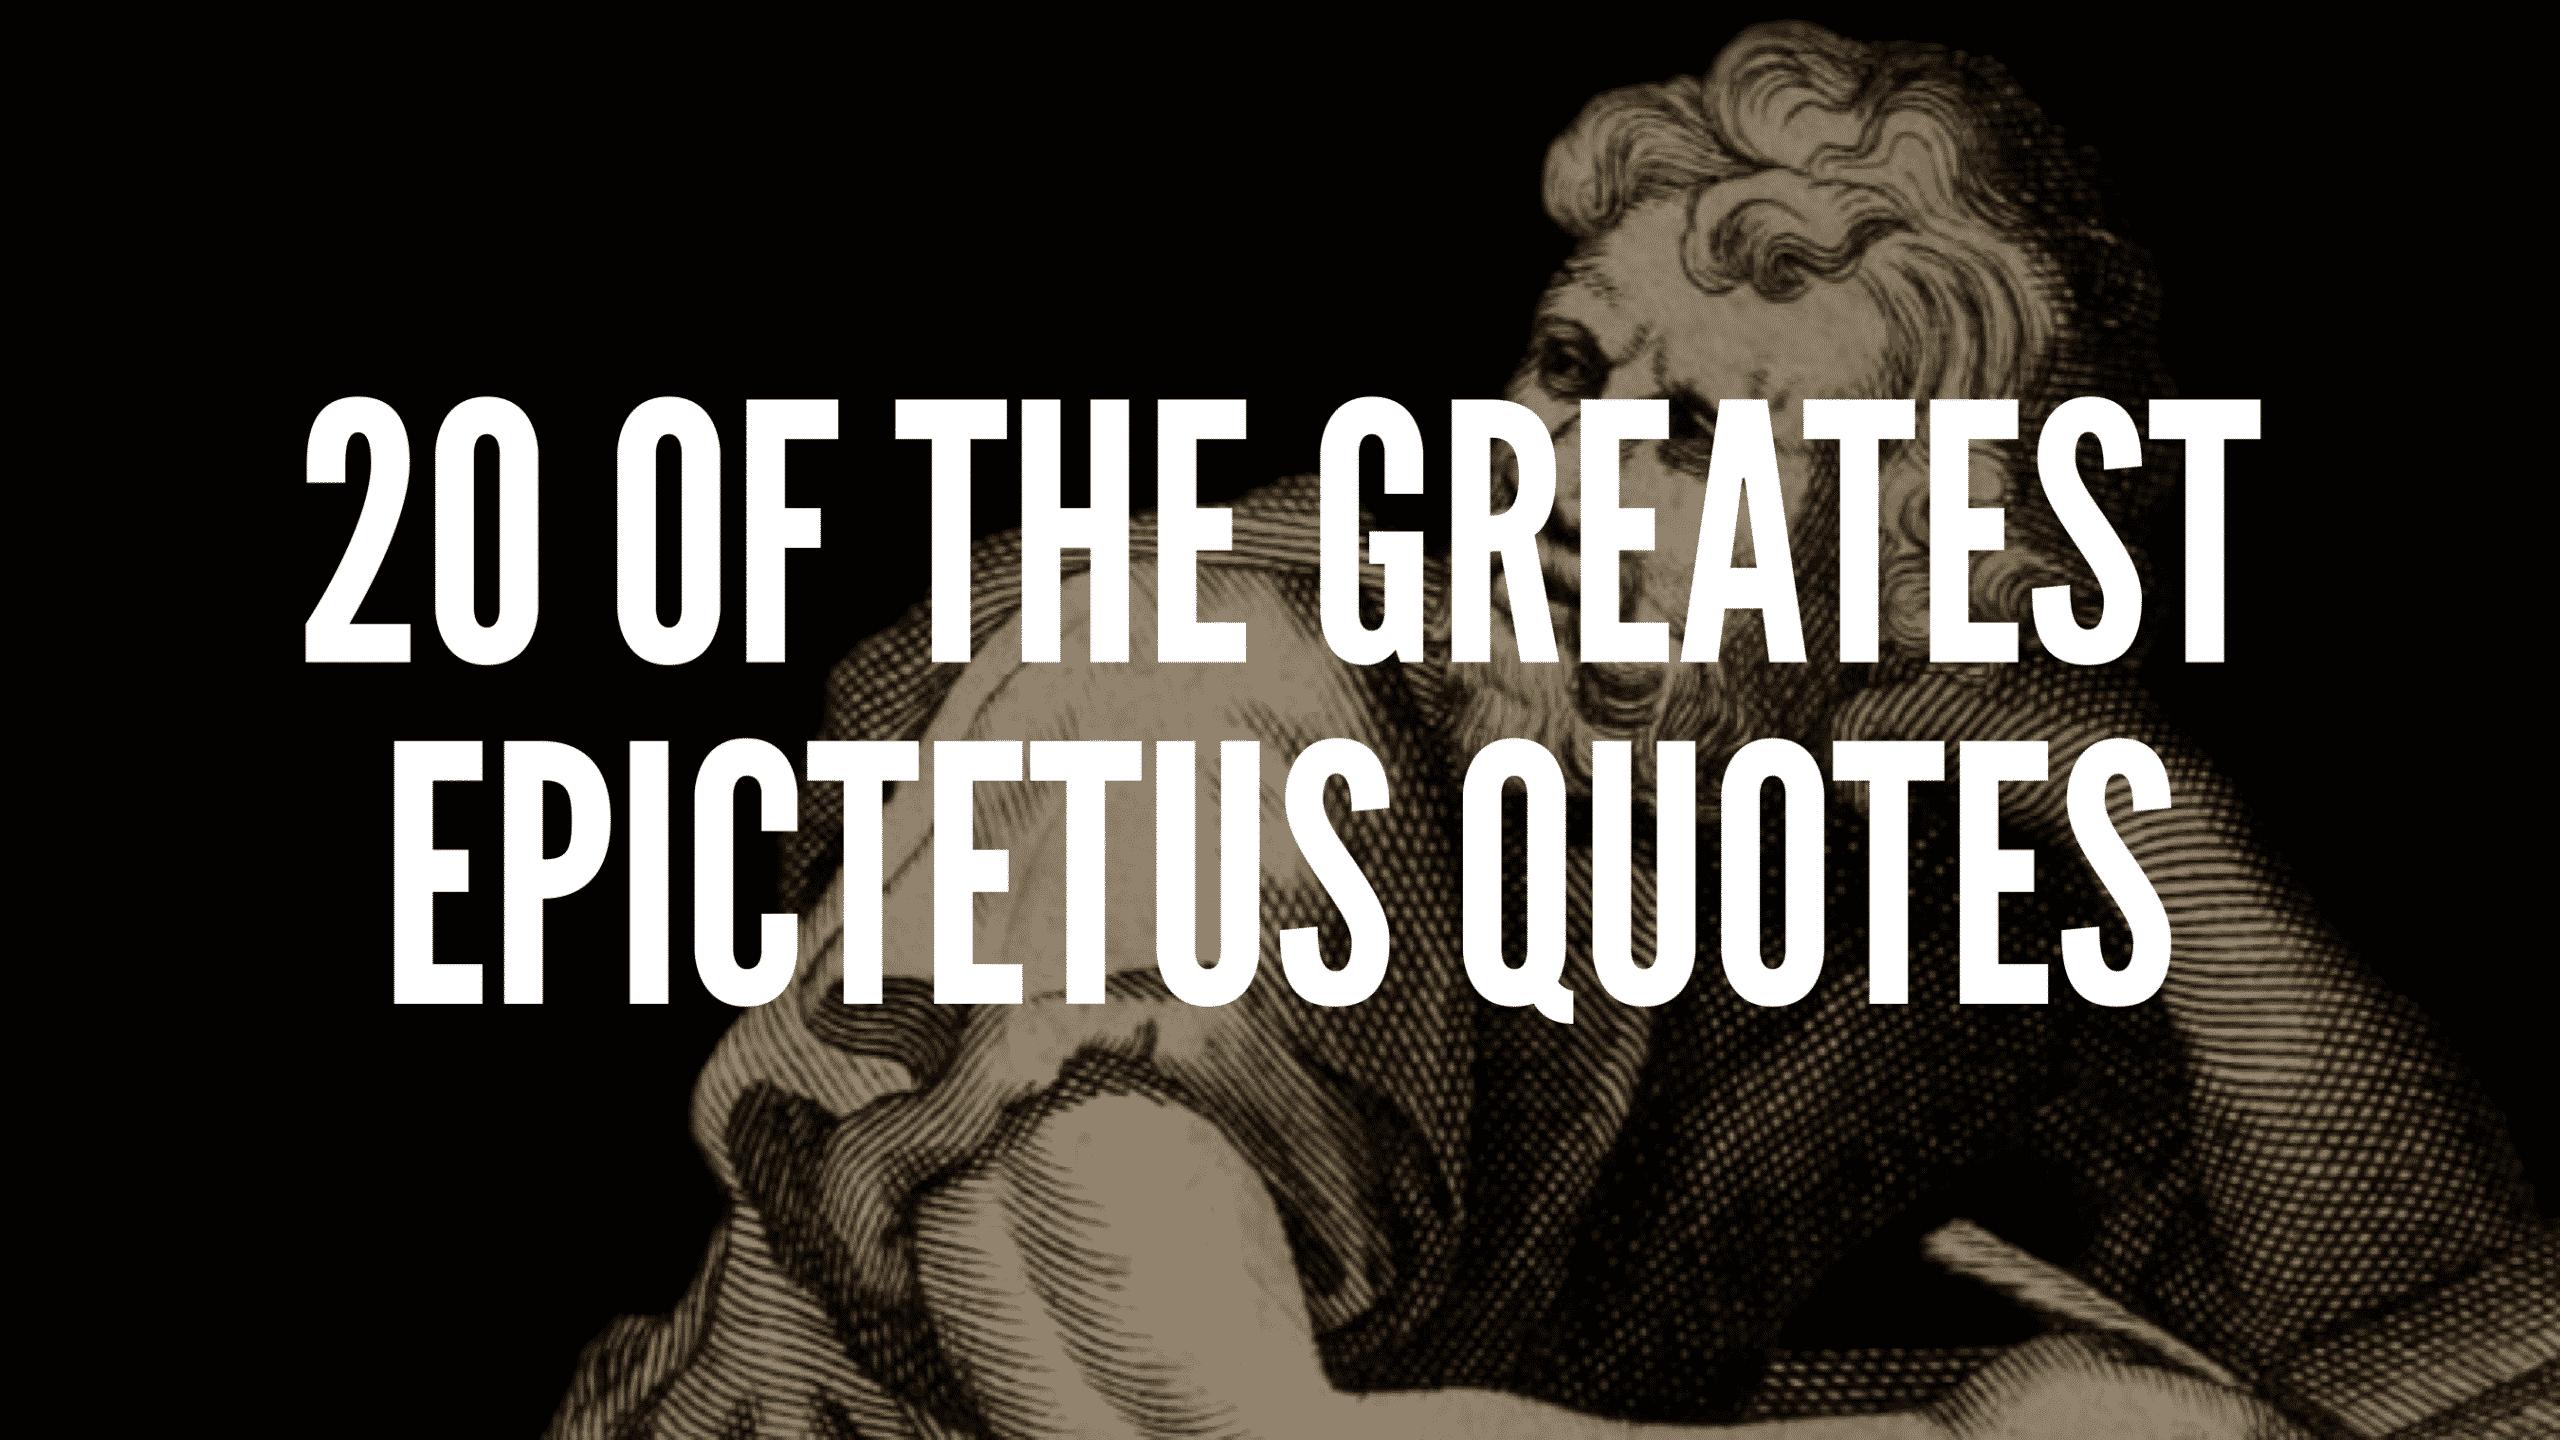 20 Of The Greatest Epictetus Quotes